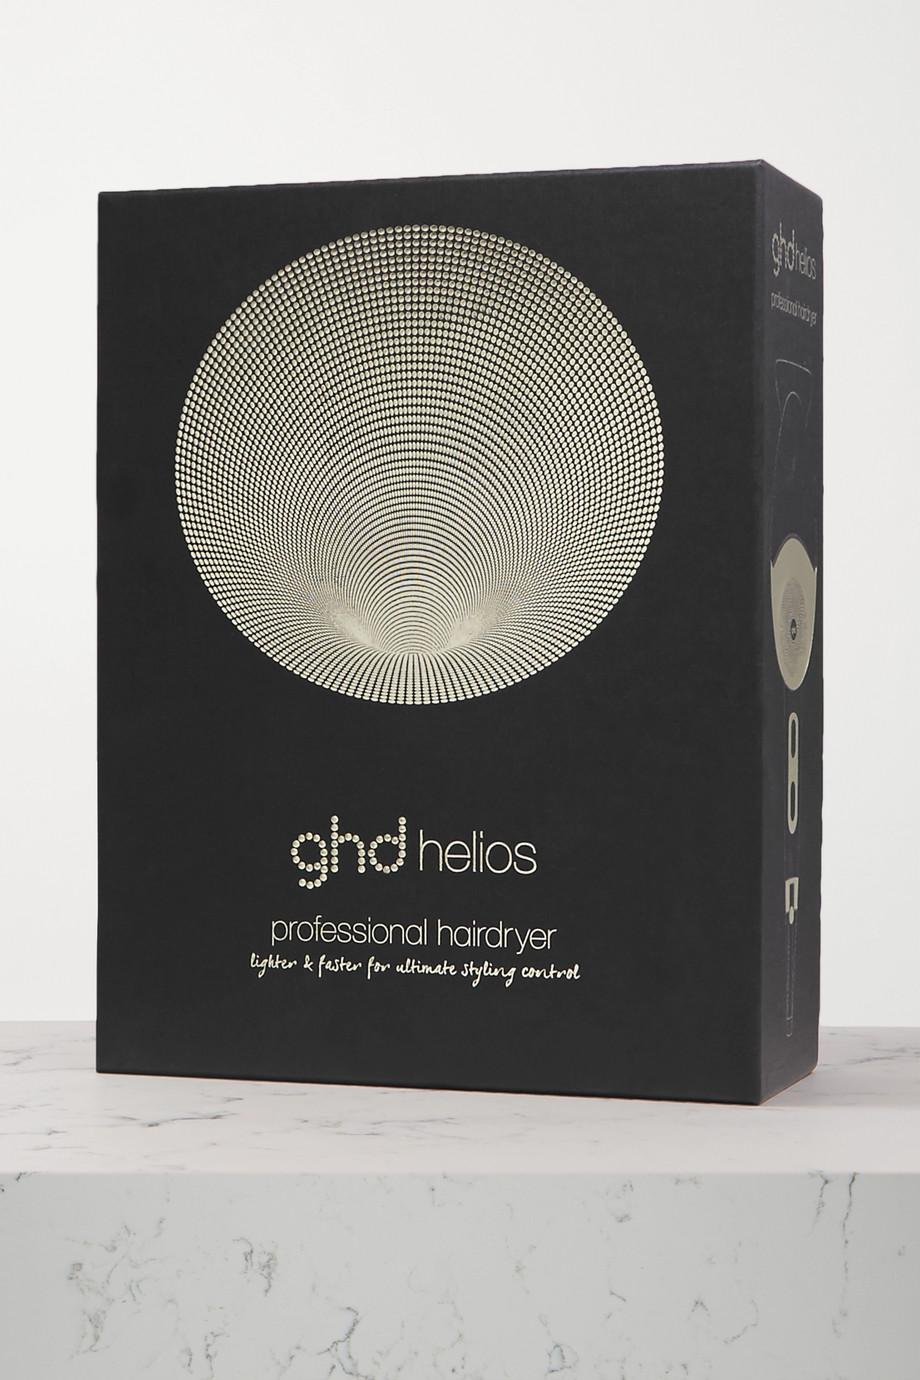 ghd Helios Professional Hairdryer - UK 3-pin plug